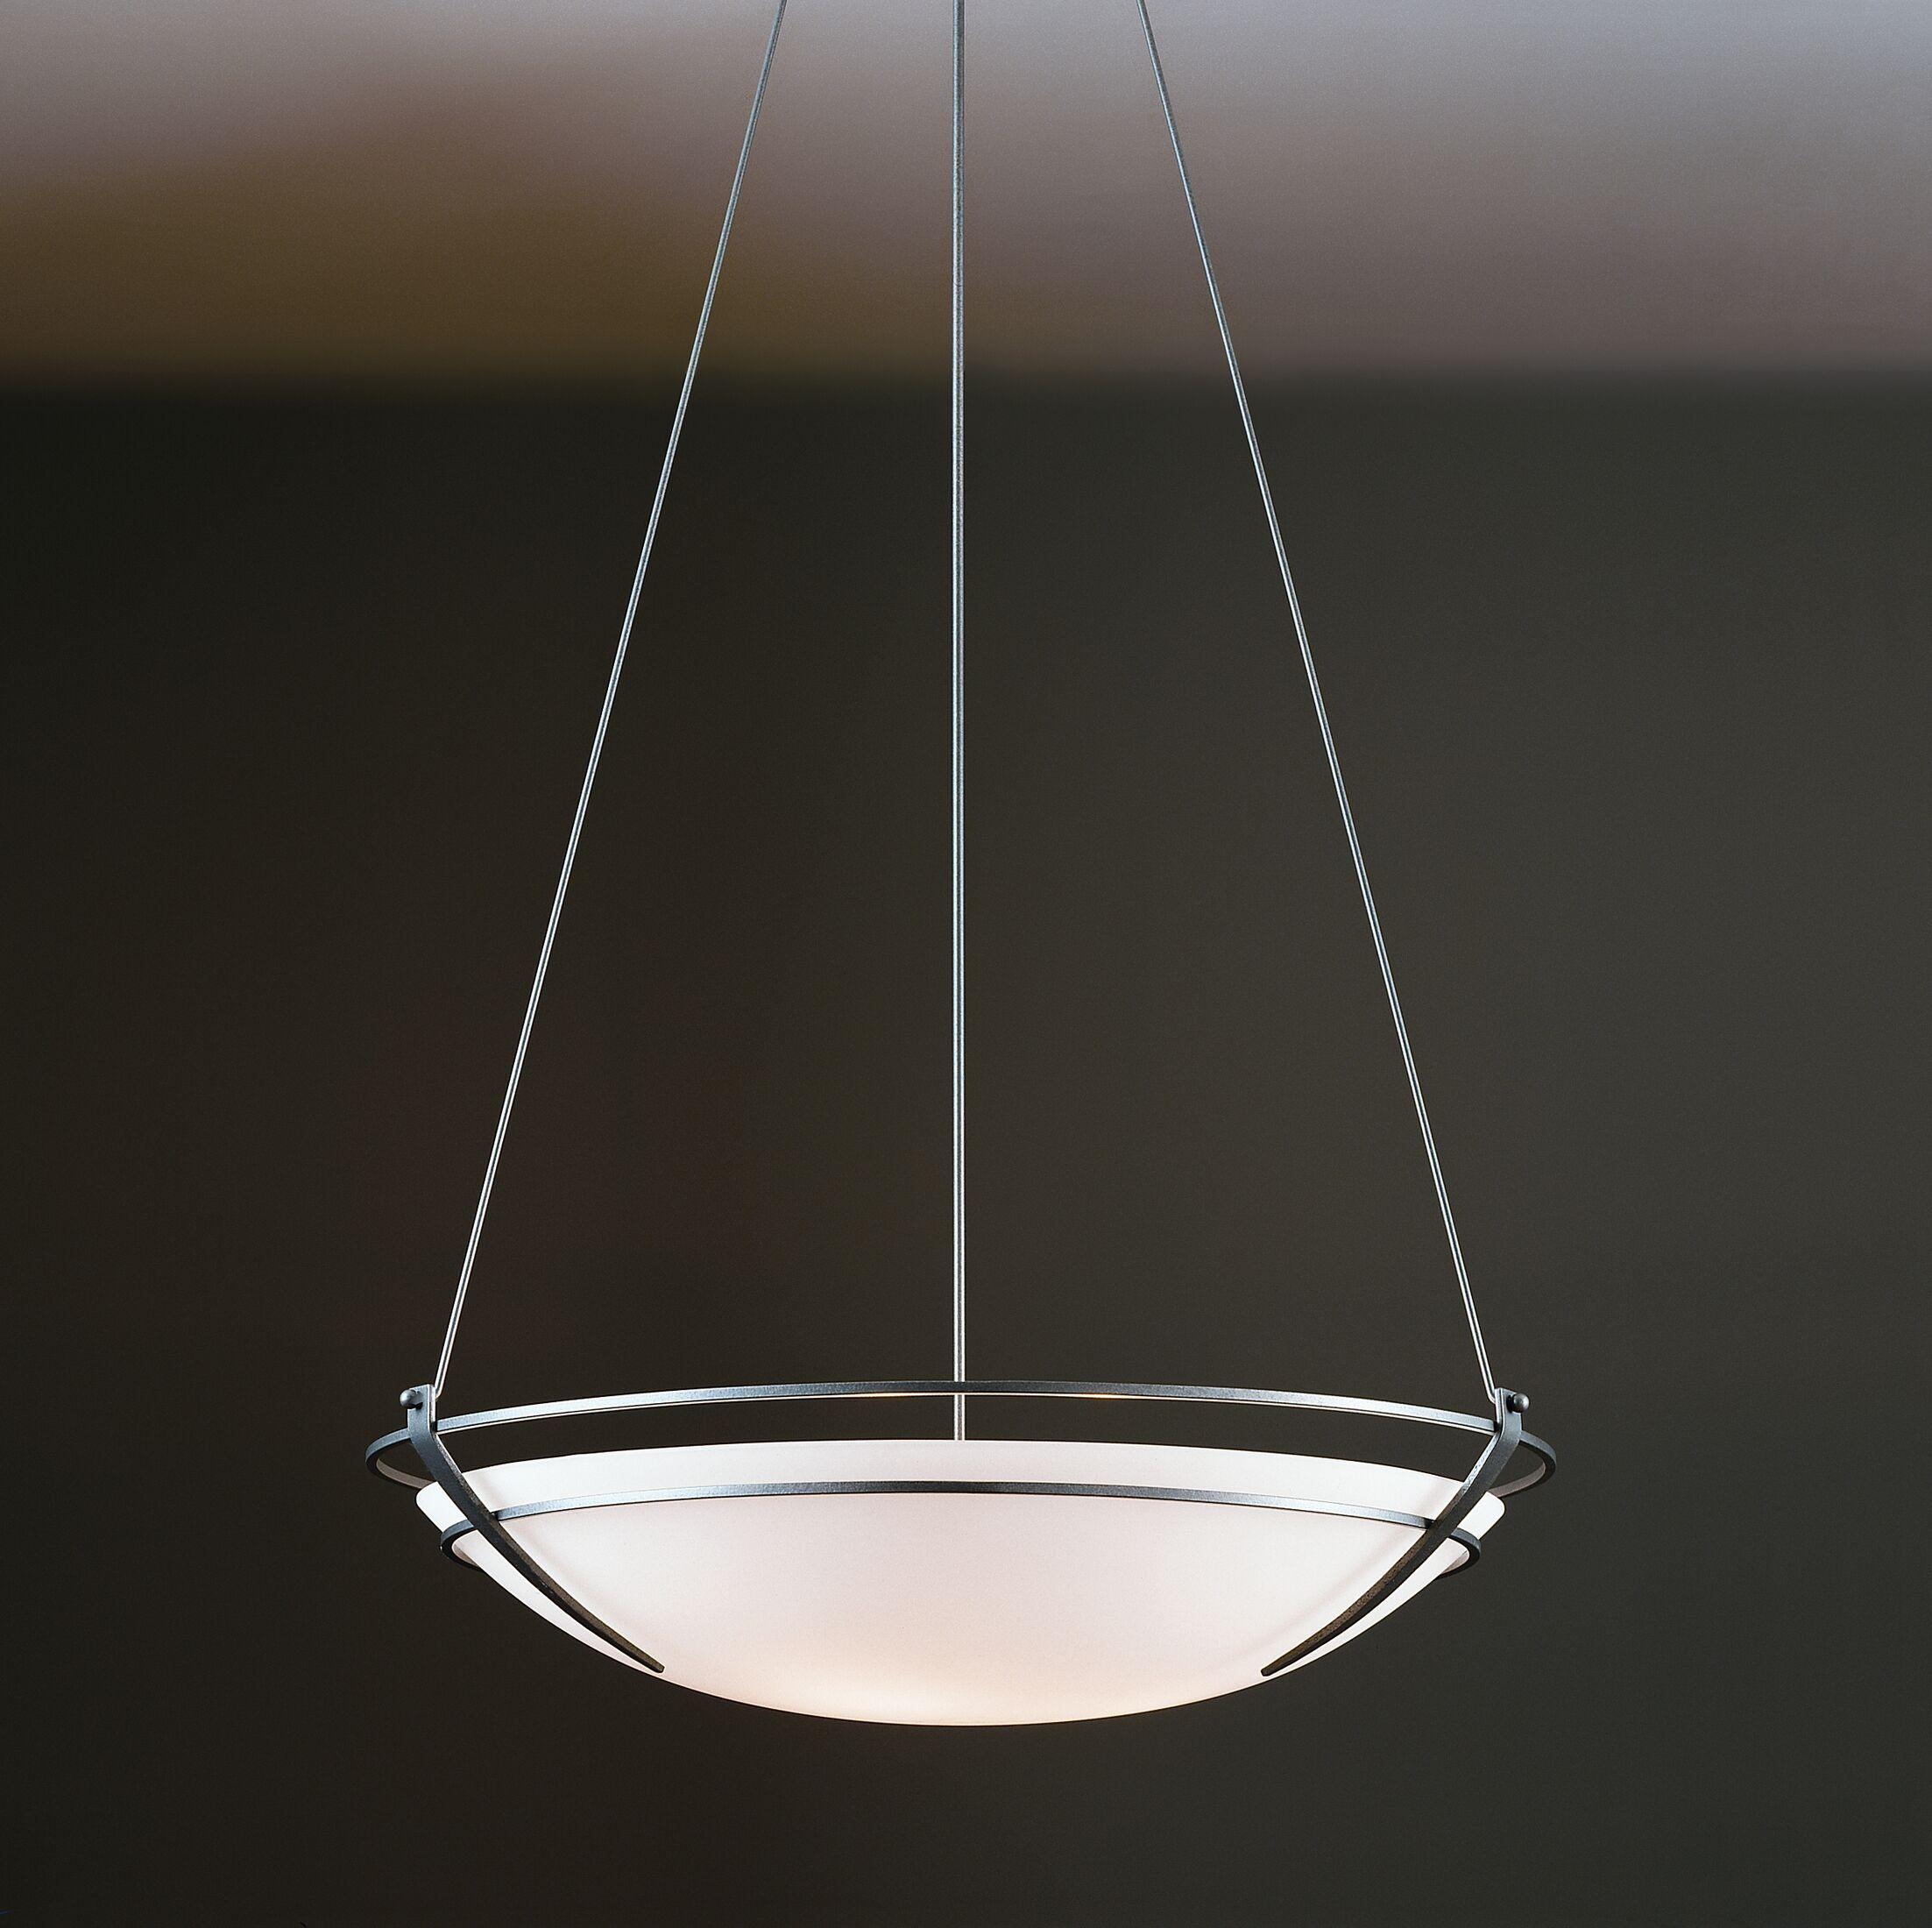 Presidio 6-Light Bowl Pendant Finish: Brushed Steel, Shade Color: Sand